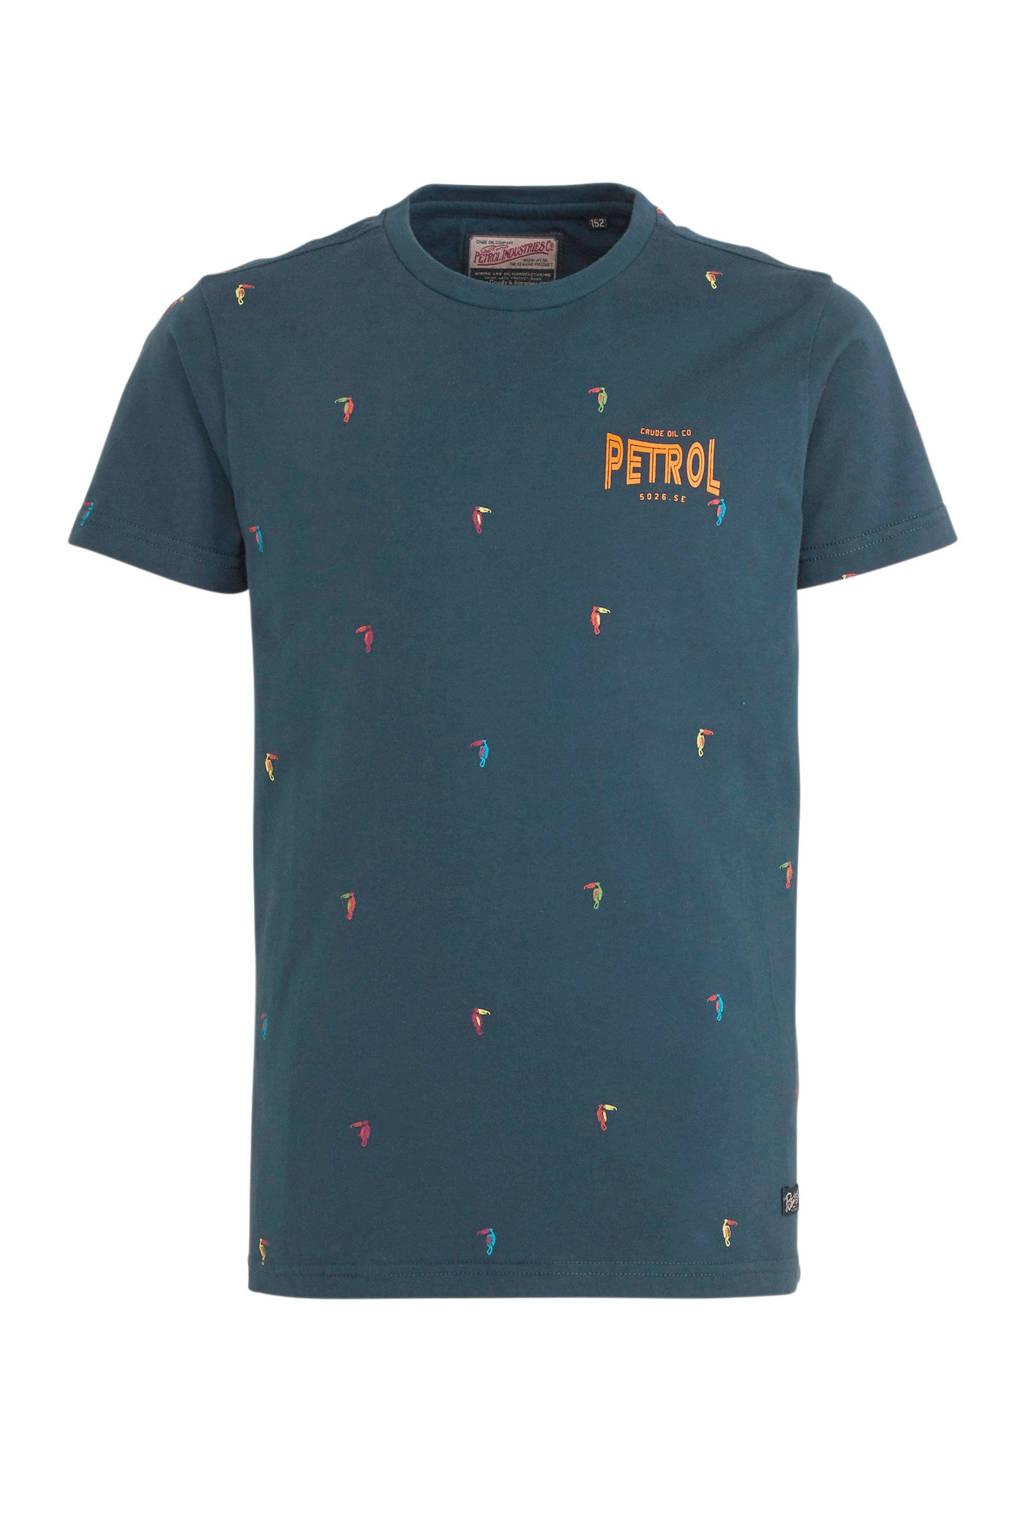 Petrol Industries T-shirt met all over print donkerblauw, Donkerblauw